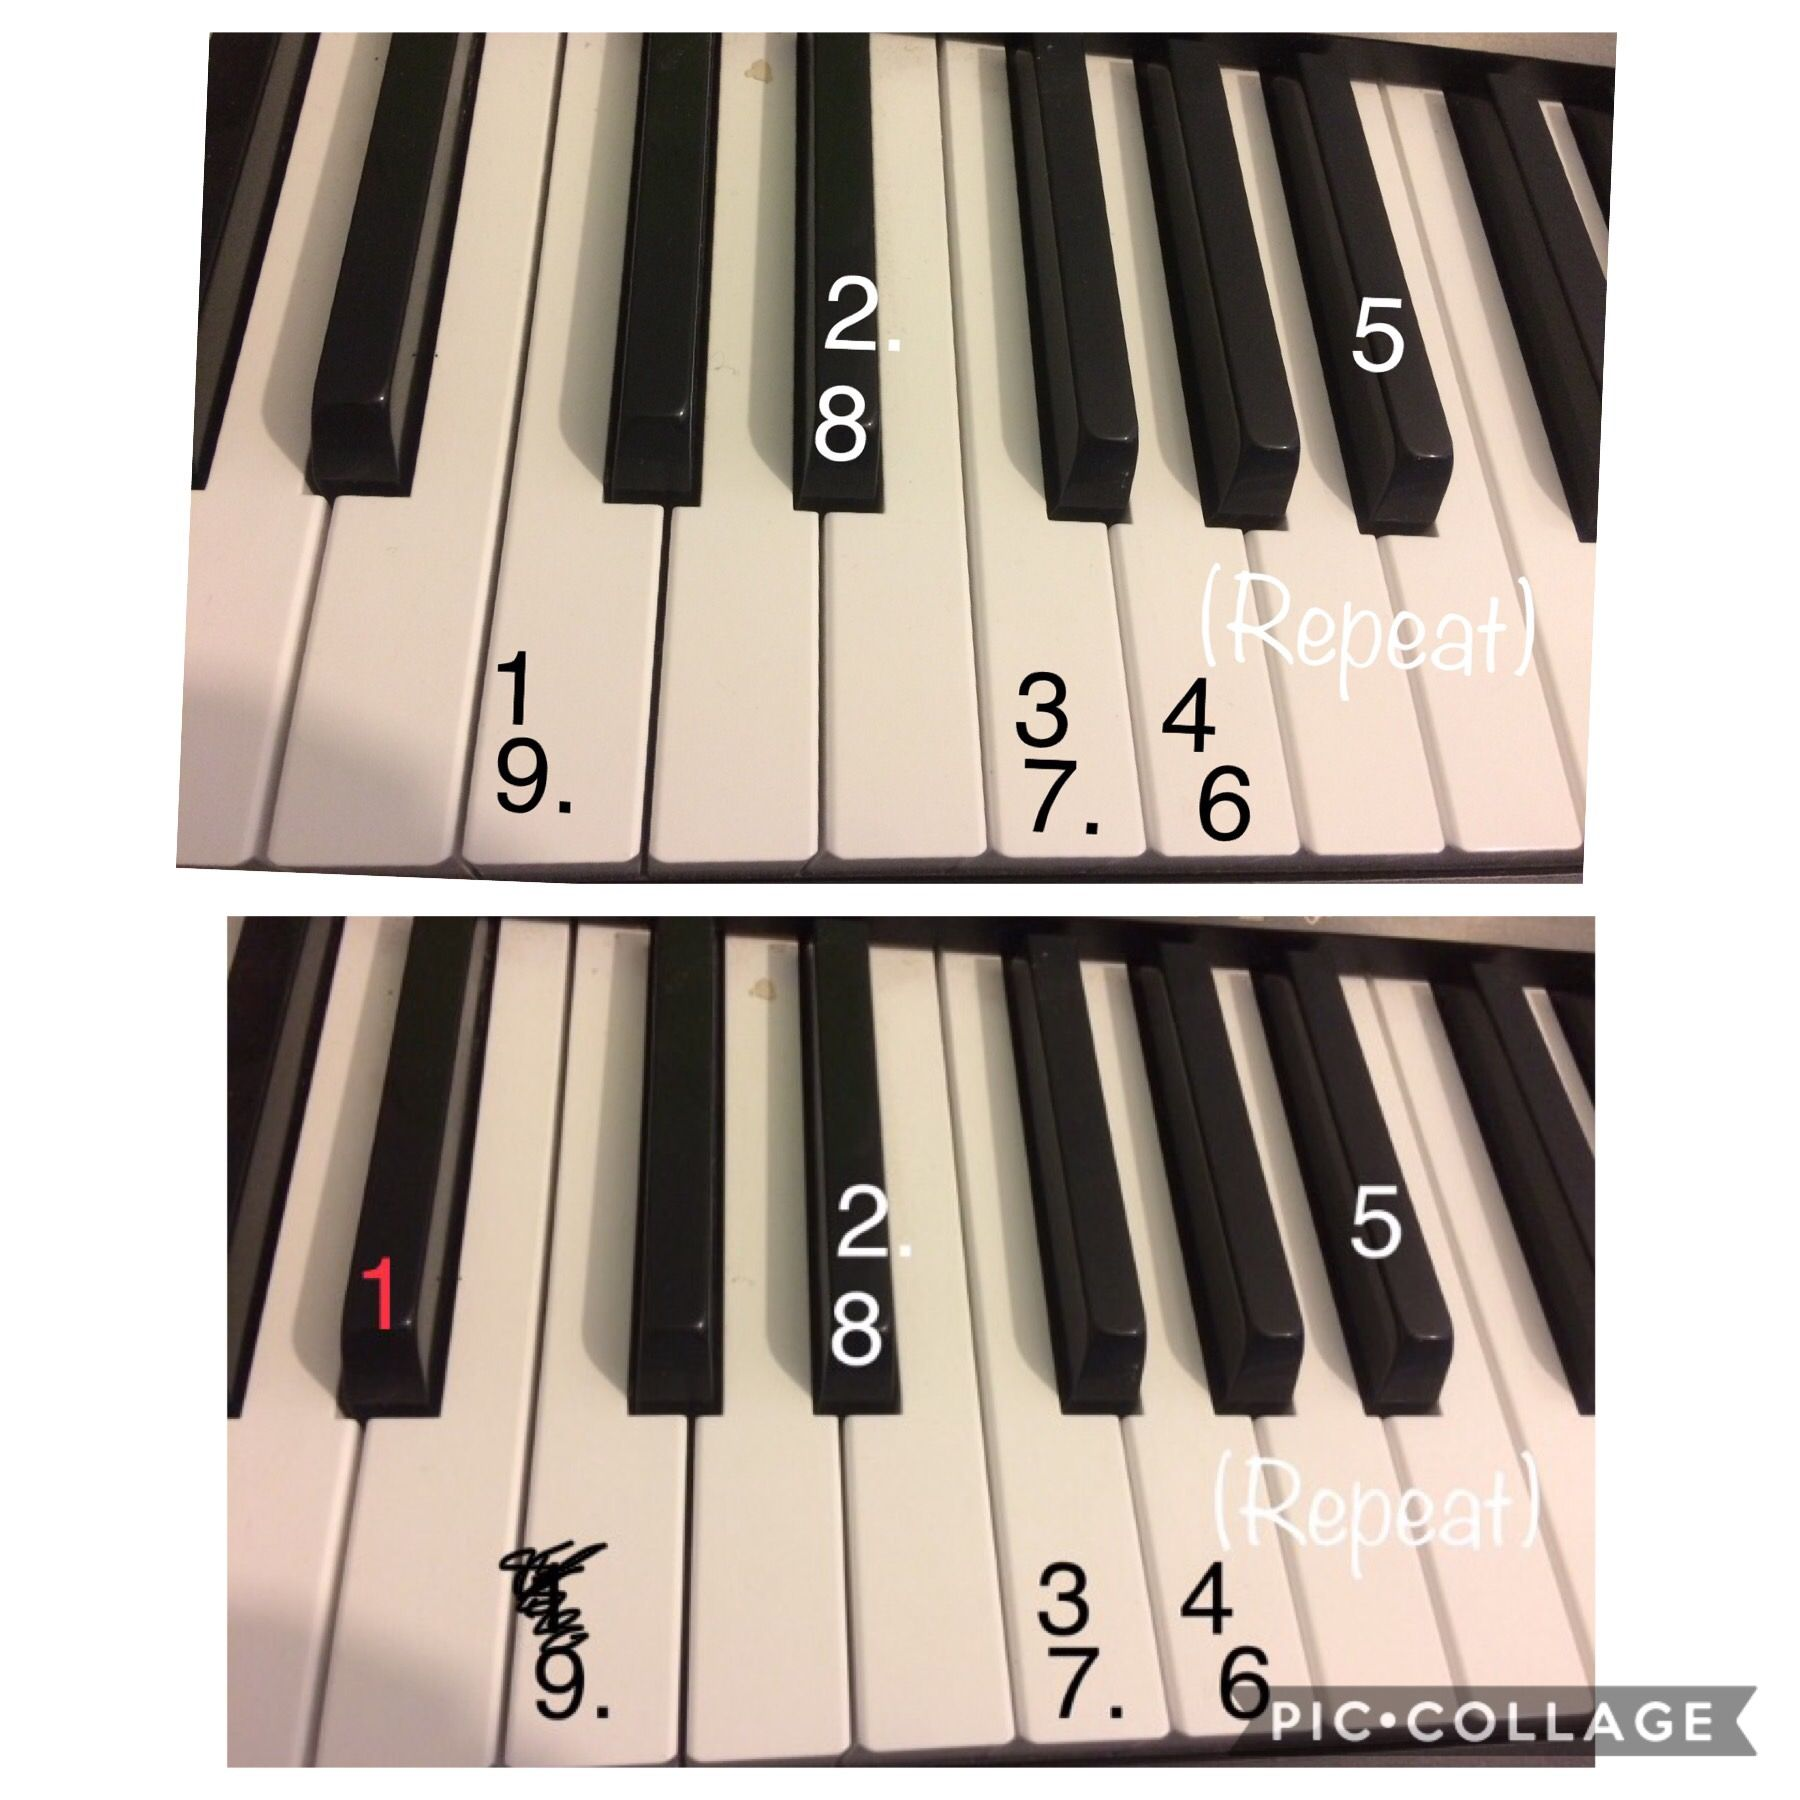 Satisfied Hamilton Piano Songs Piano Piano Music